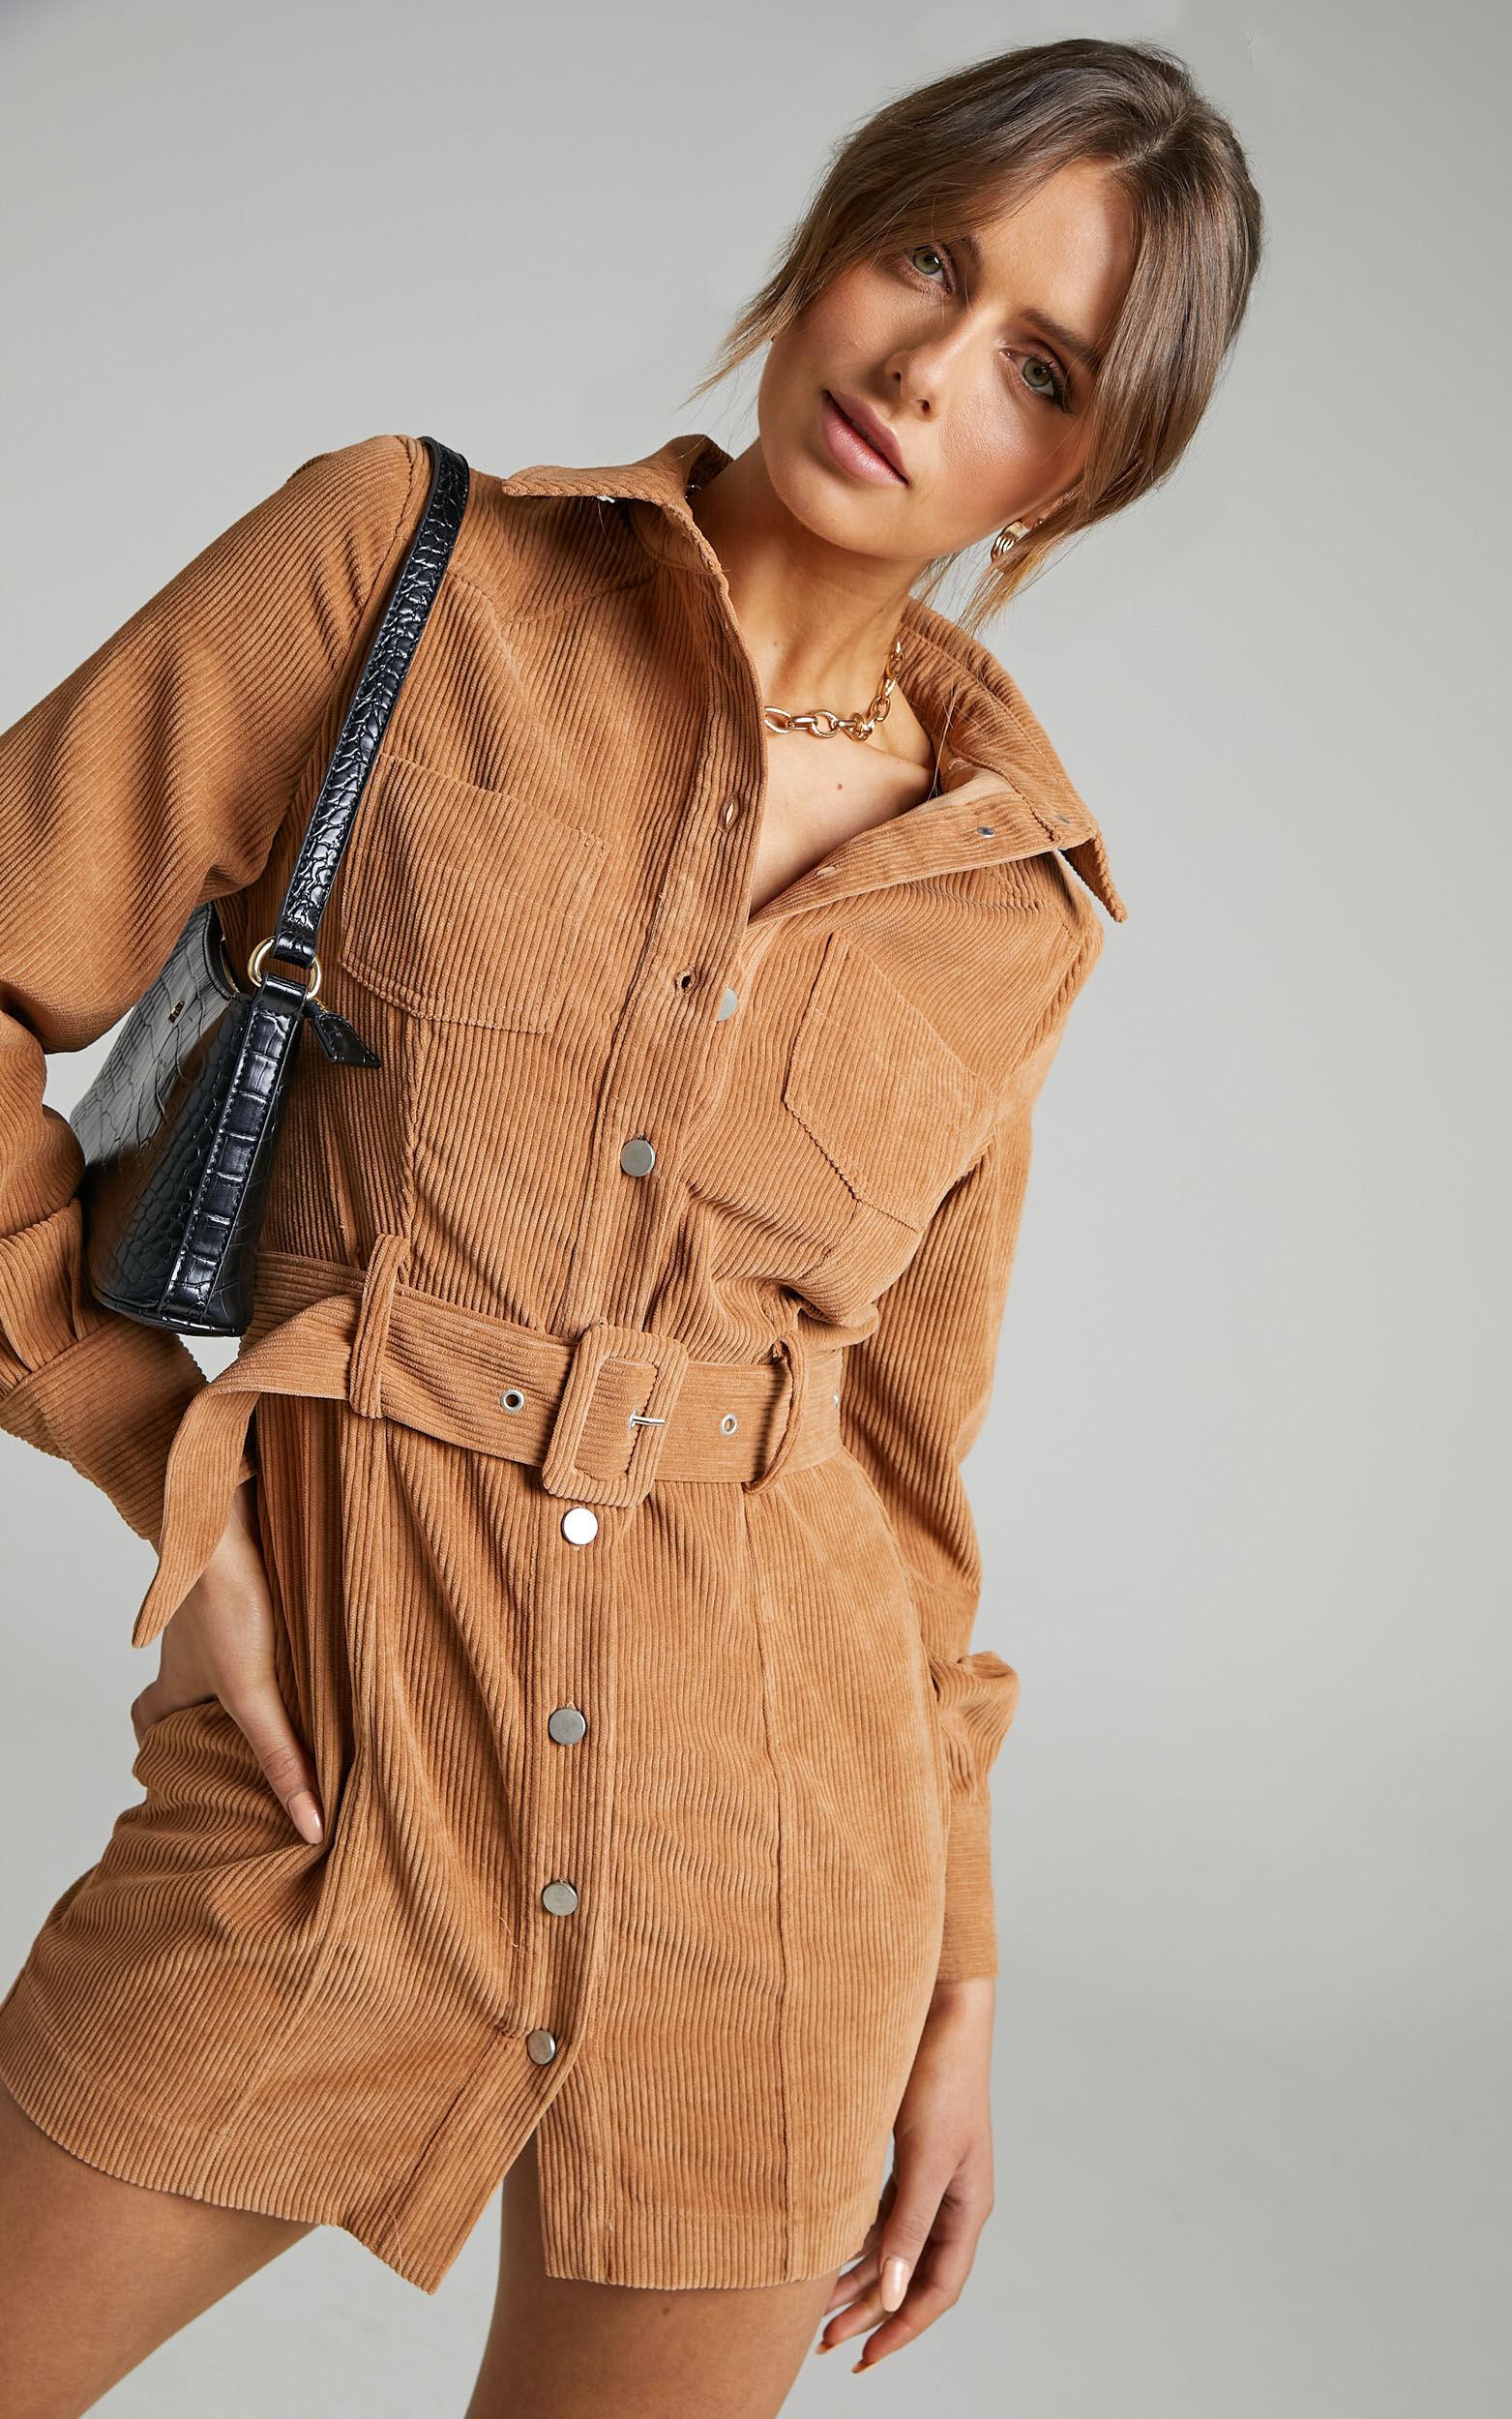 Lida Mini Long Sleeve Belted Corduroy Dress in Chocolate - 06, BRN2, super-hi-res image number null